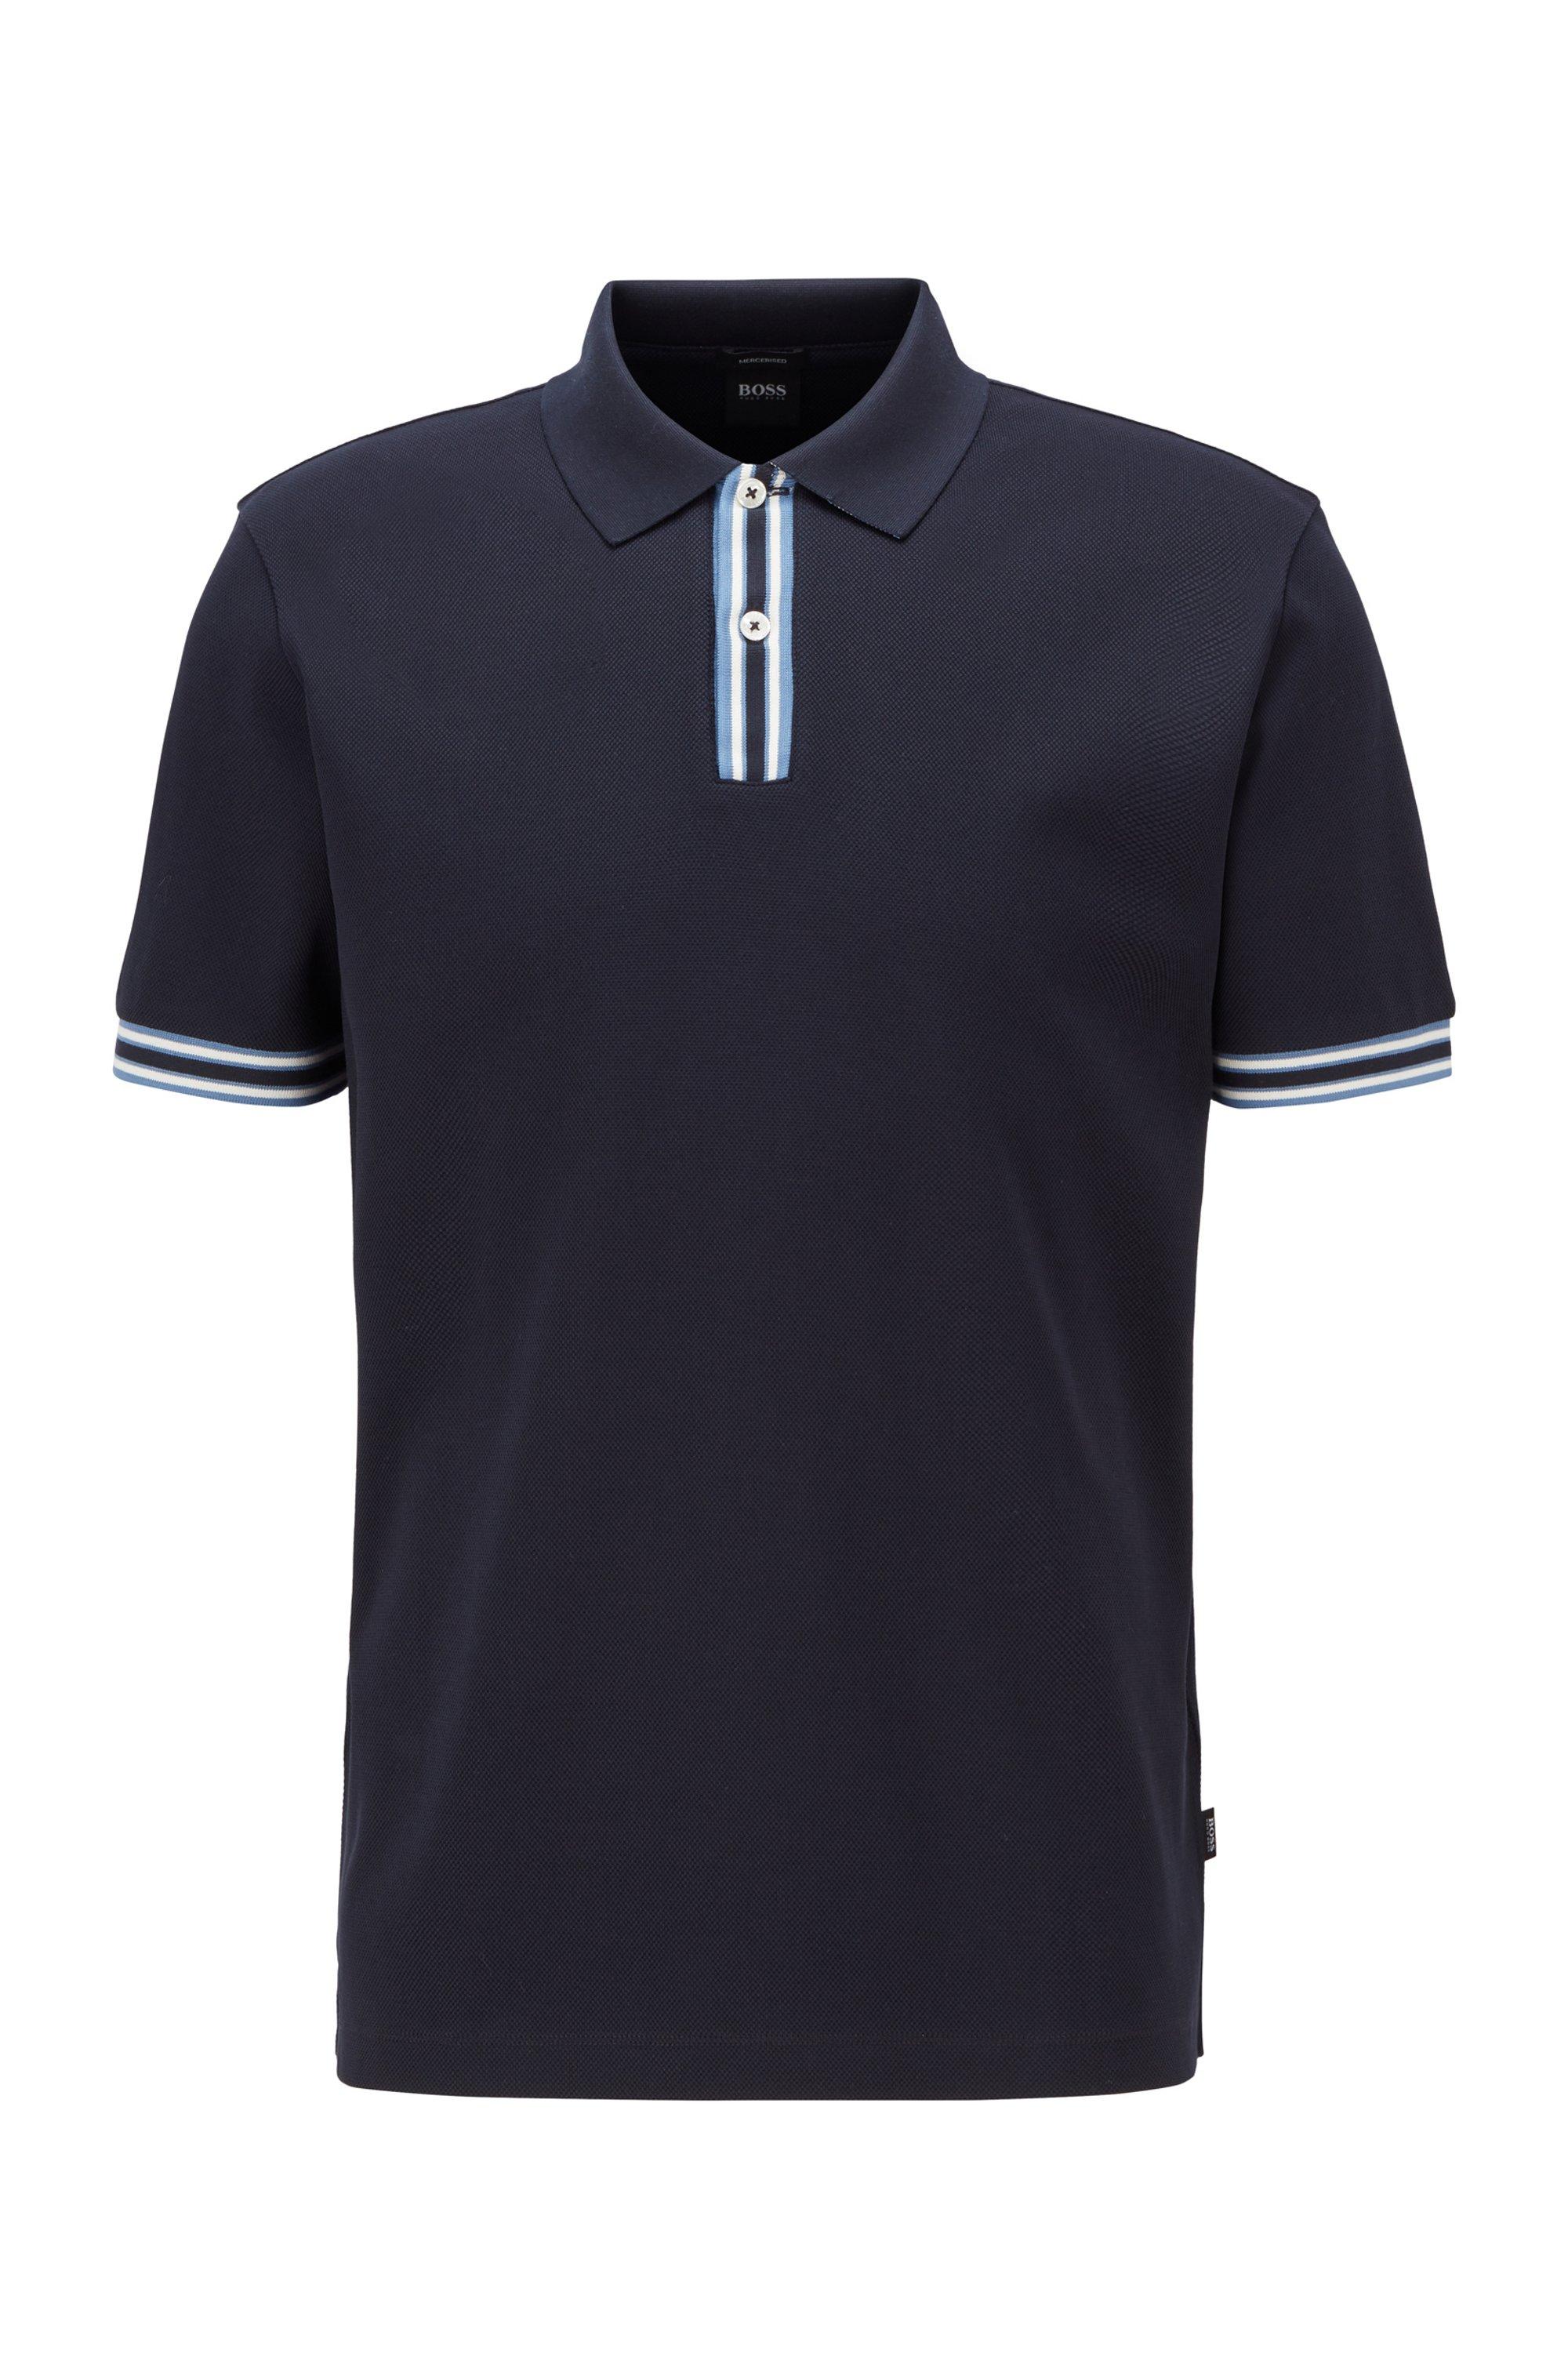 Polo shirt in mercerised cotton with stripe details, Dark Blue